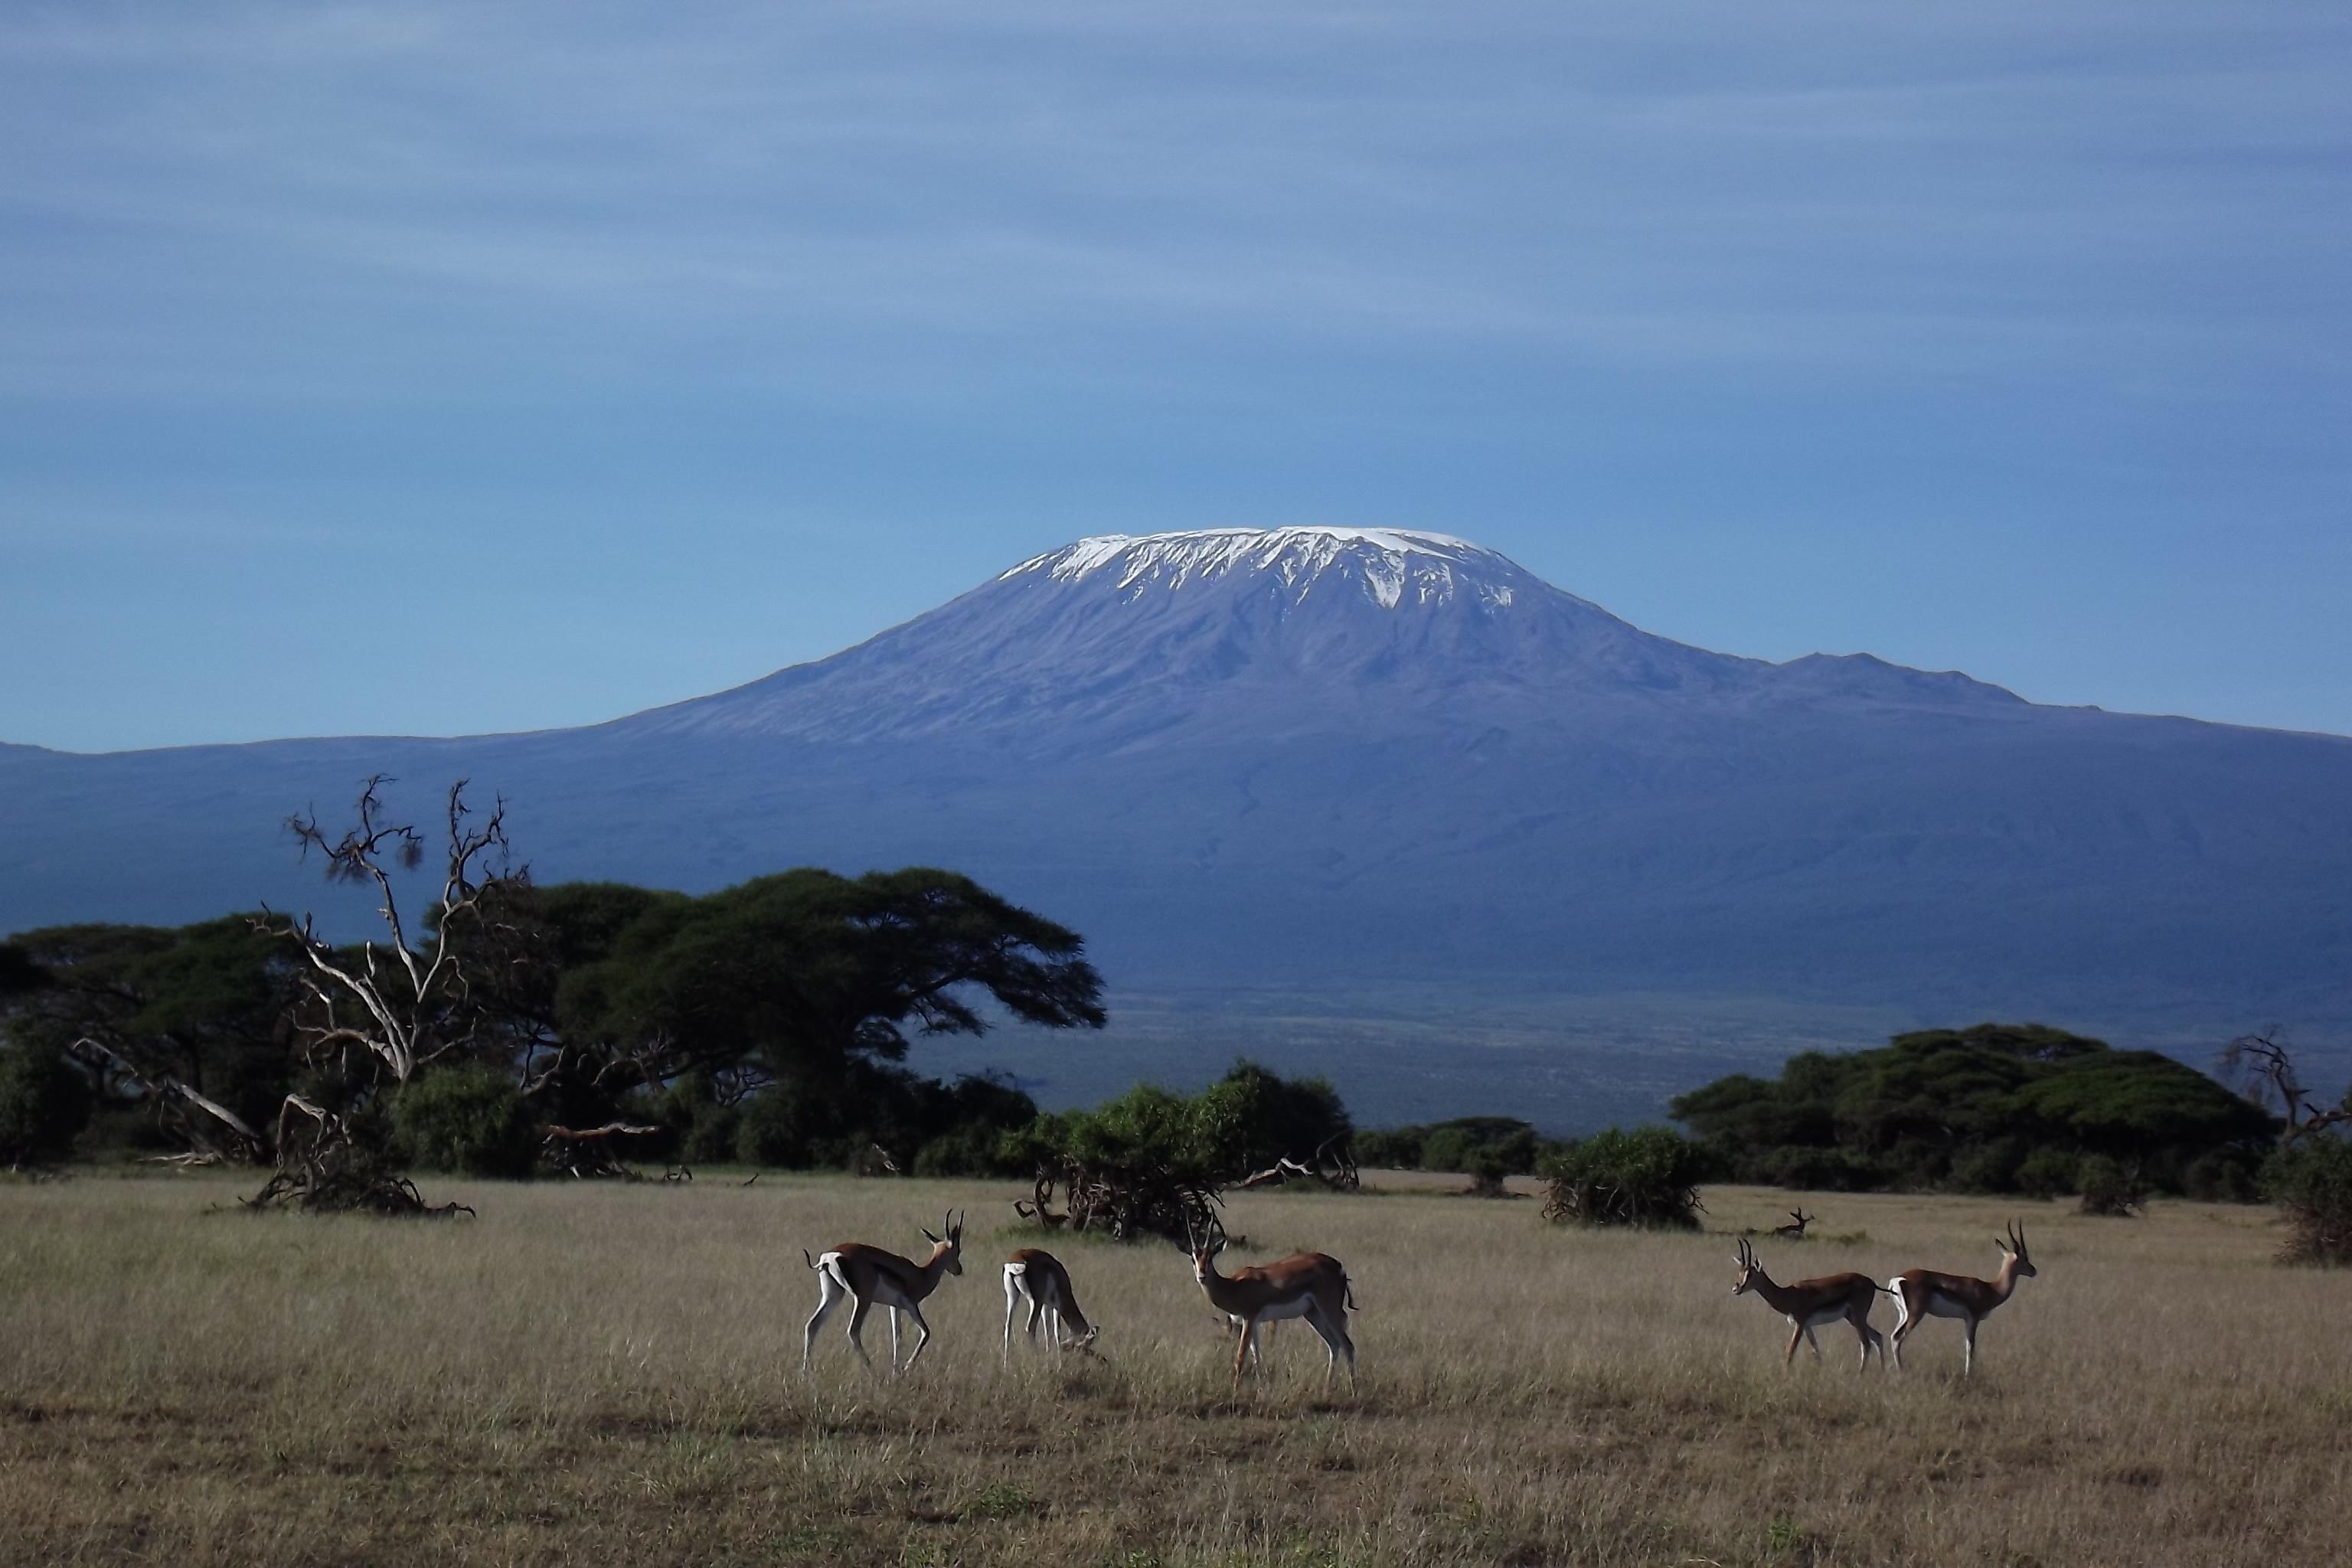 View of Kilimanjaro Amboseli National Park